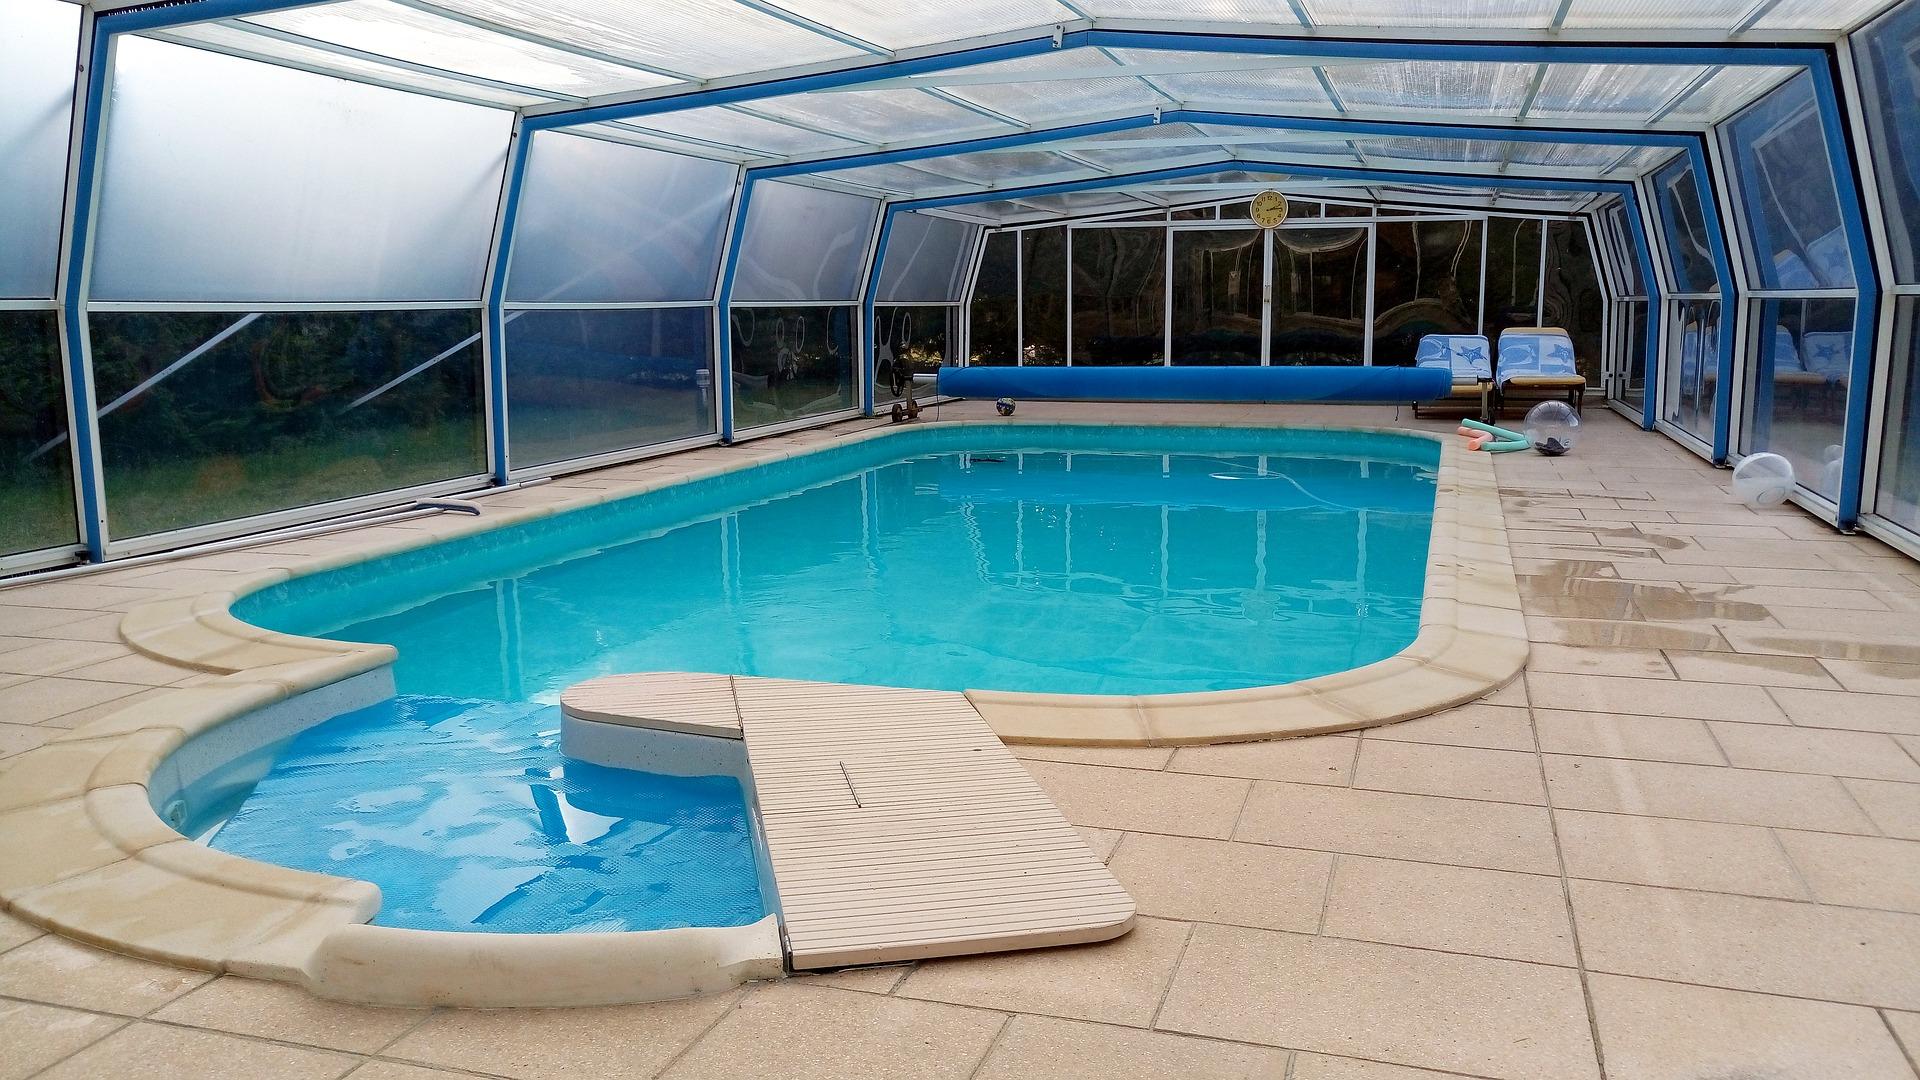 prix abris de piscine great design prix abri piscine plat toulon decore ahurissant prix abri. Black Bedroom Furniture Sets. Home Design Ideas